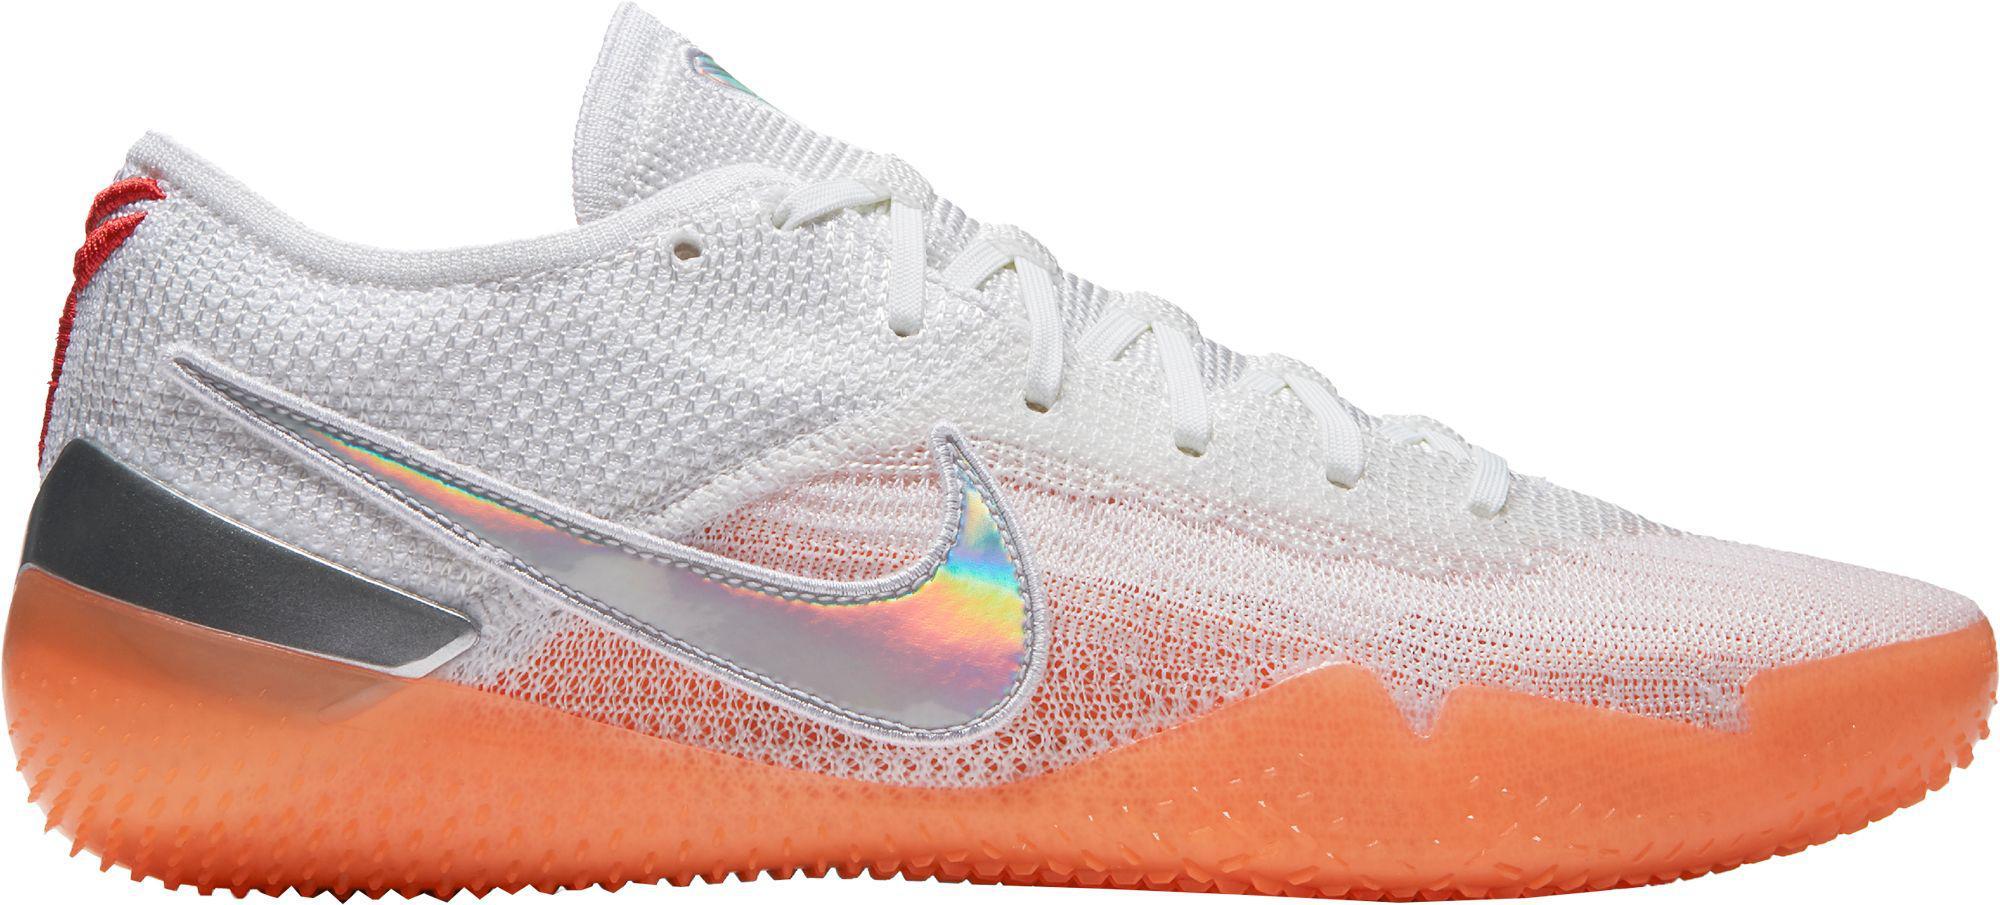 new york 17db1 ca0b2 Nike - White Kobe A.d. Nxt 360 Basketball Shoes for Men - Lyst